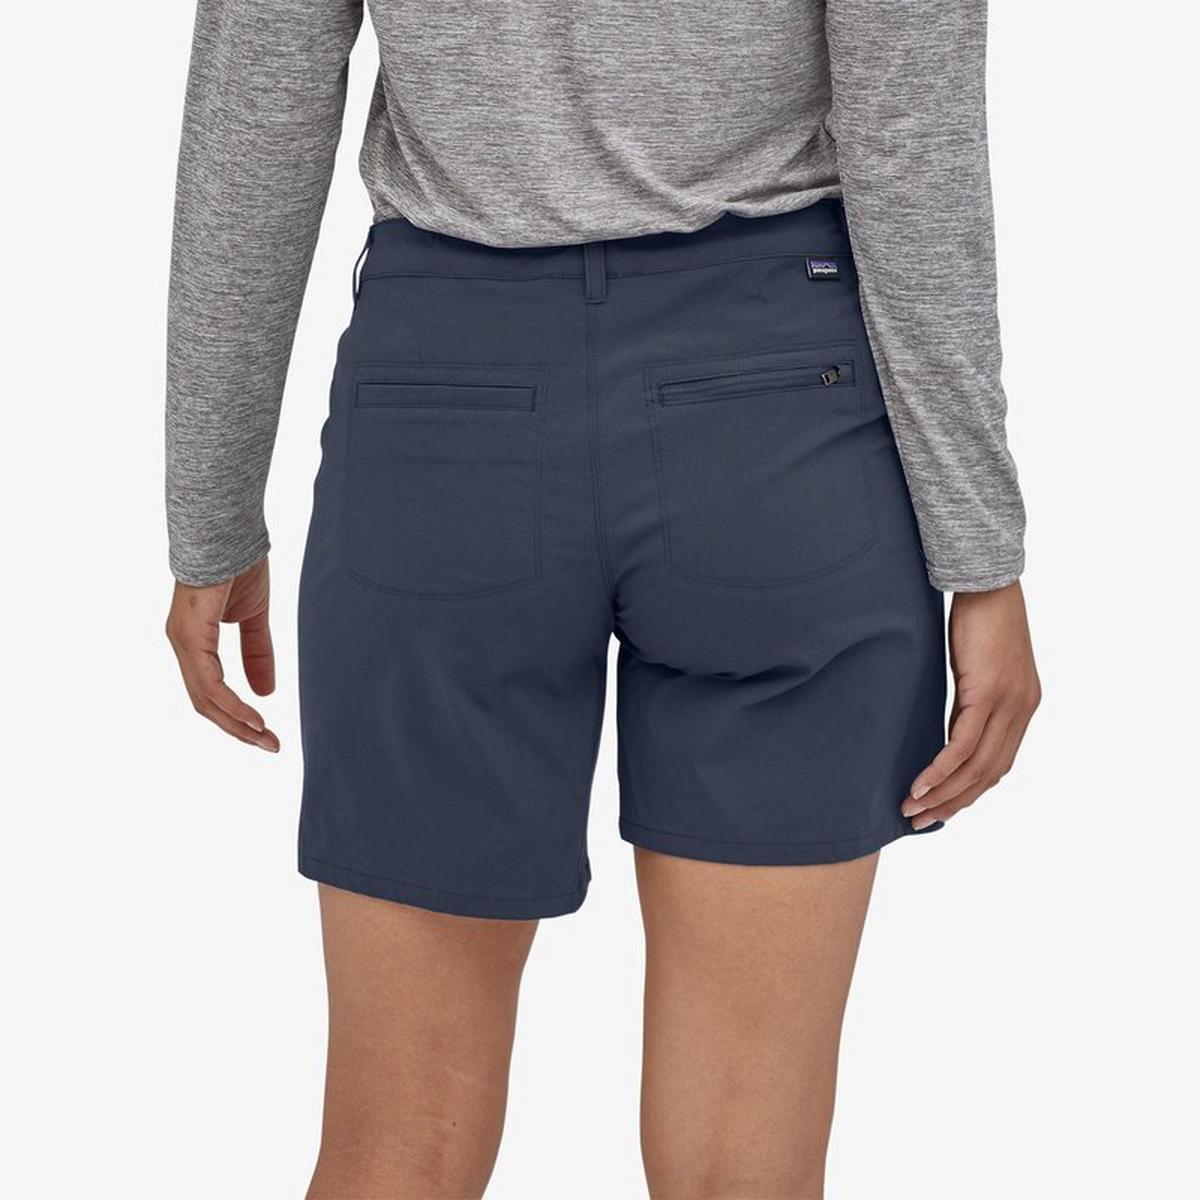 "Patagonia Women's Quandary 7"" Shorts - New Navy"